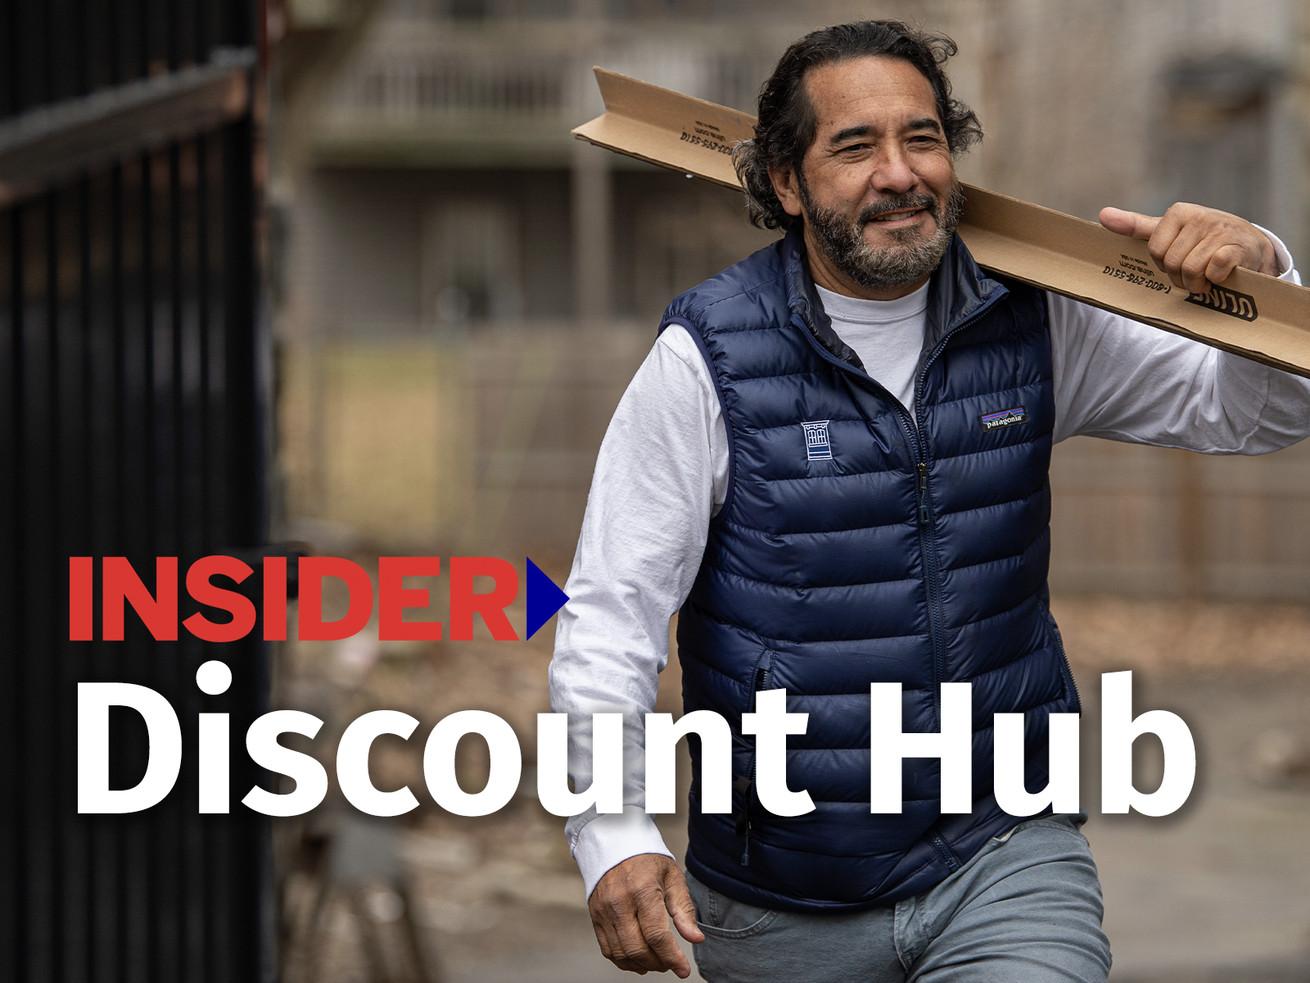 Insider Discount Hub